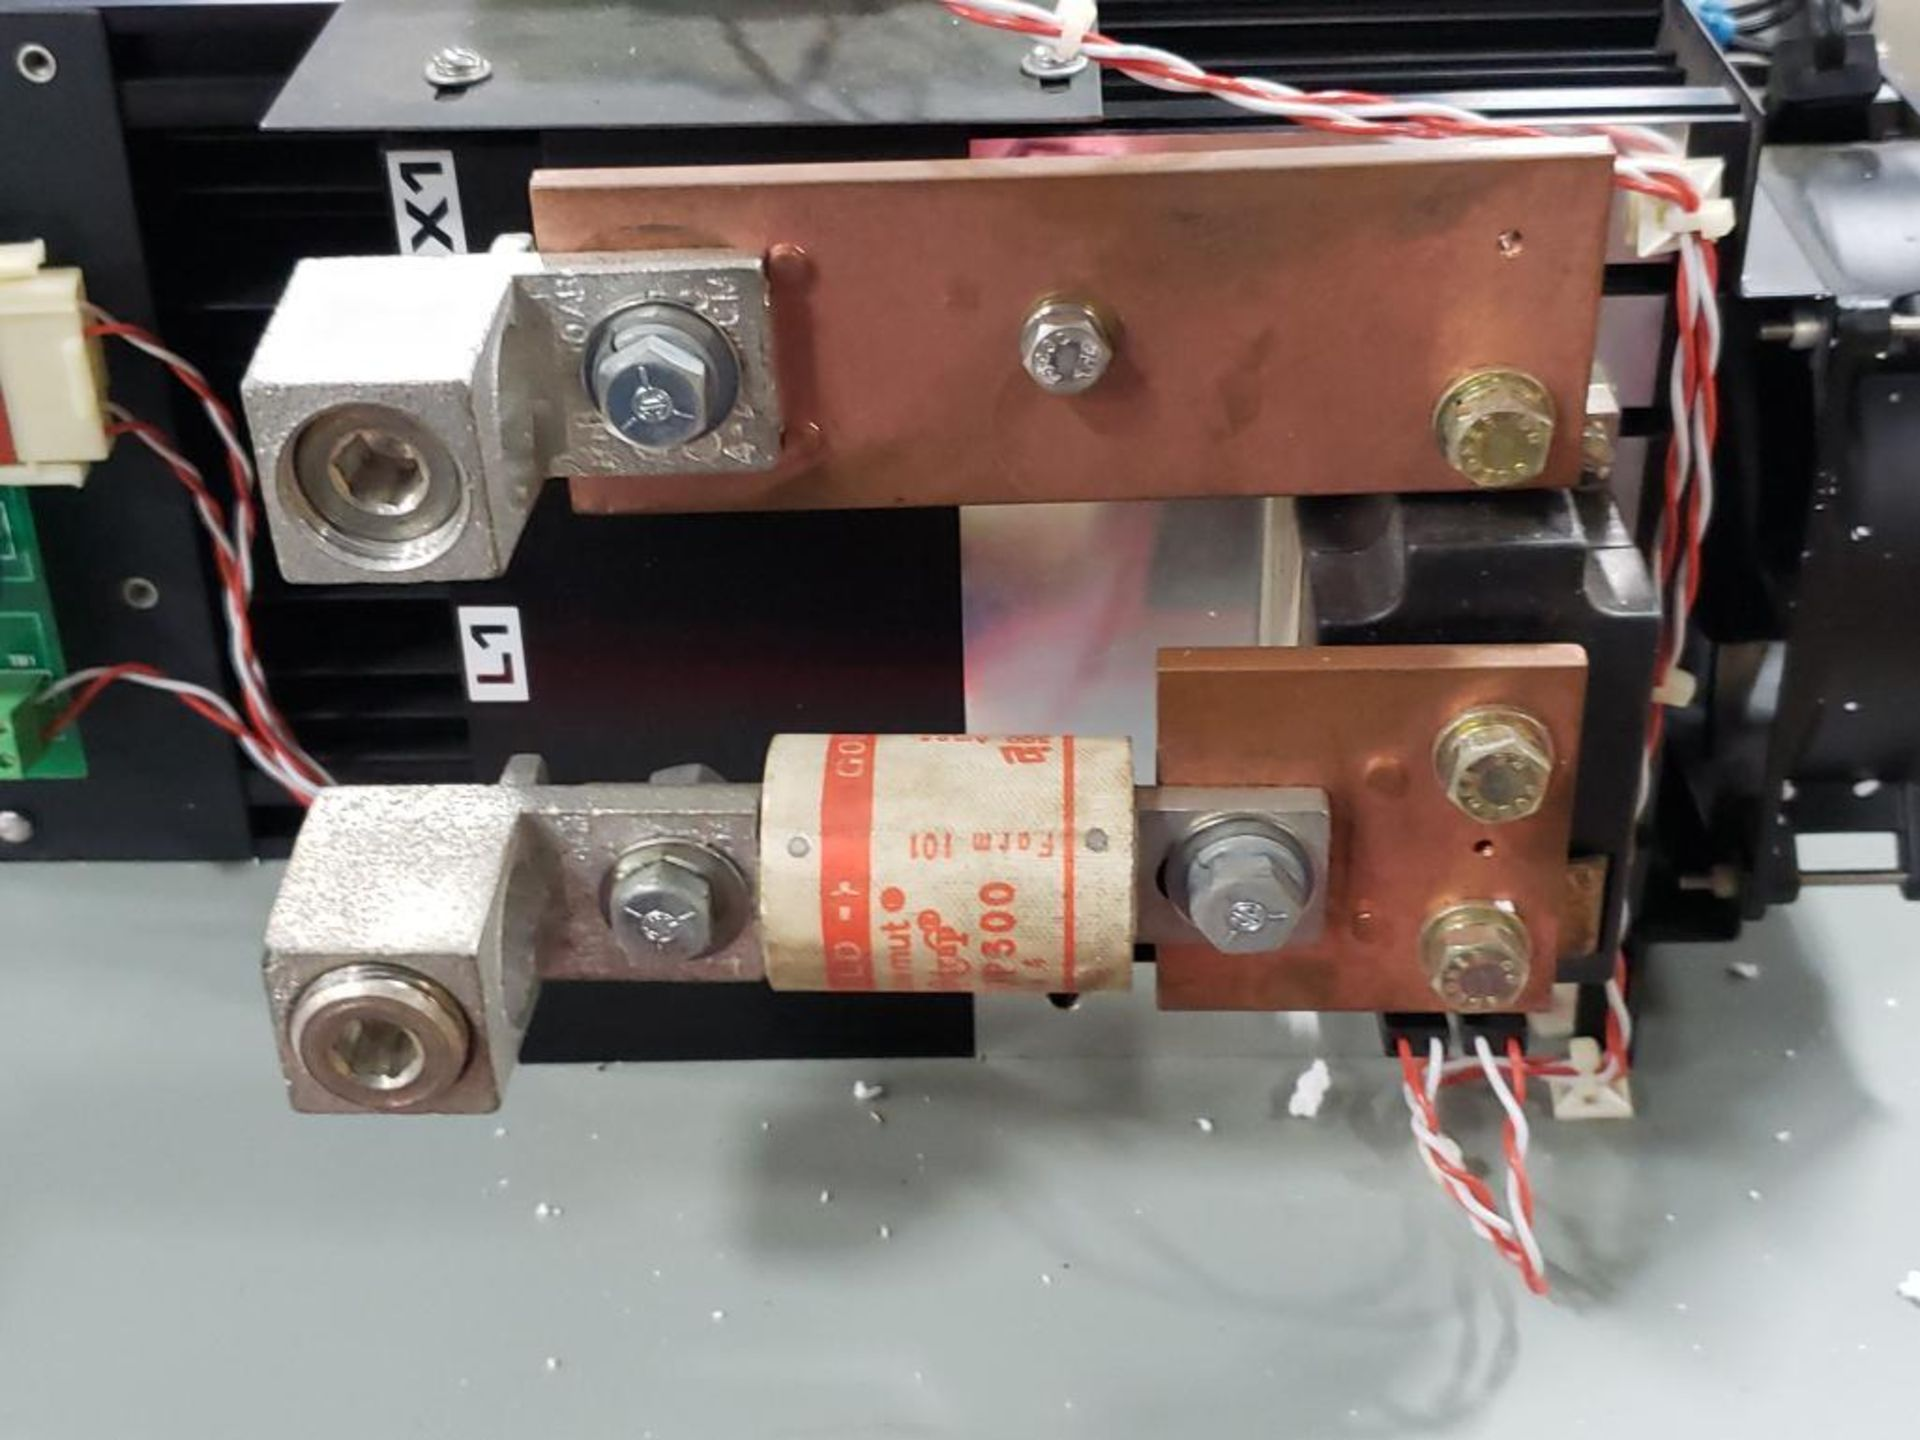 Chromalox 7830-309520-0400 power pak controller. - Image 9 of 10